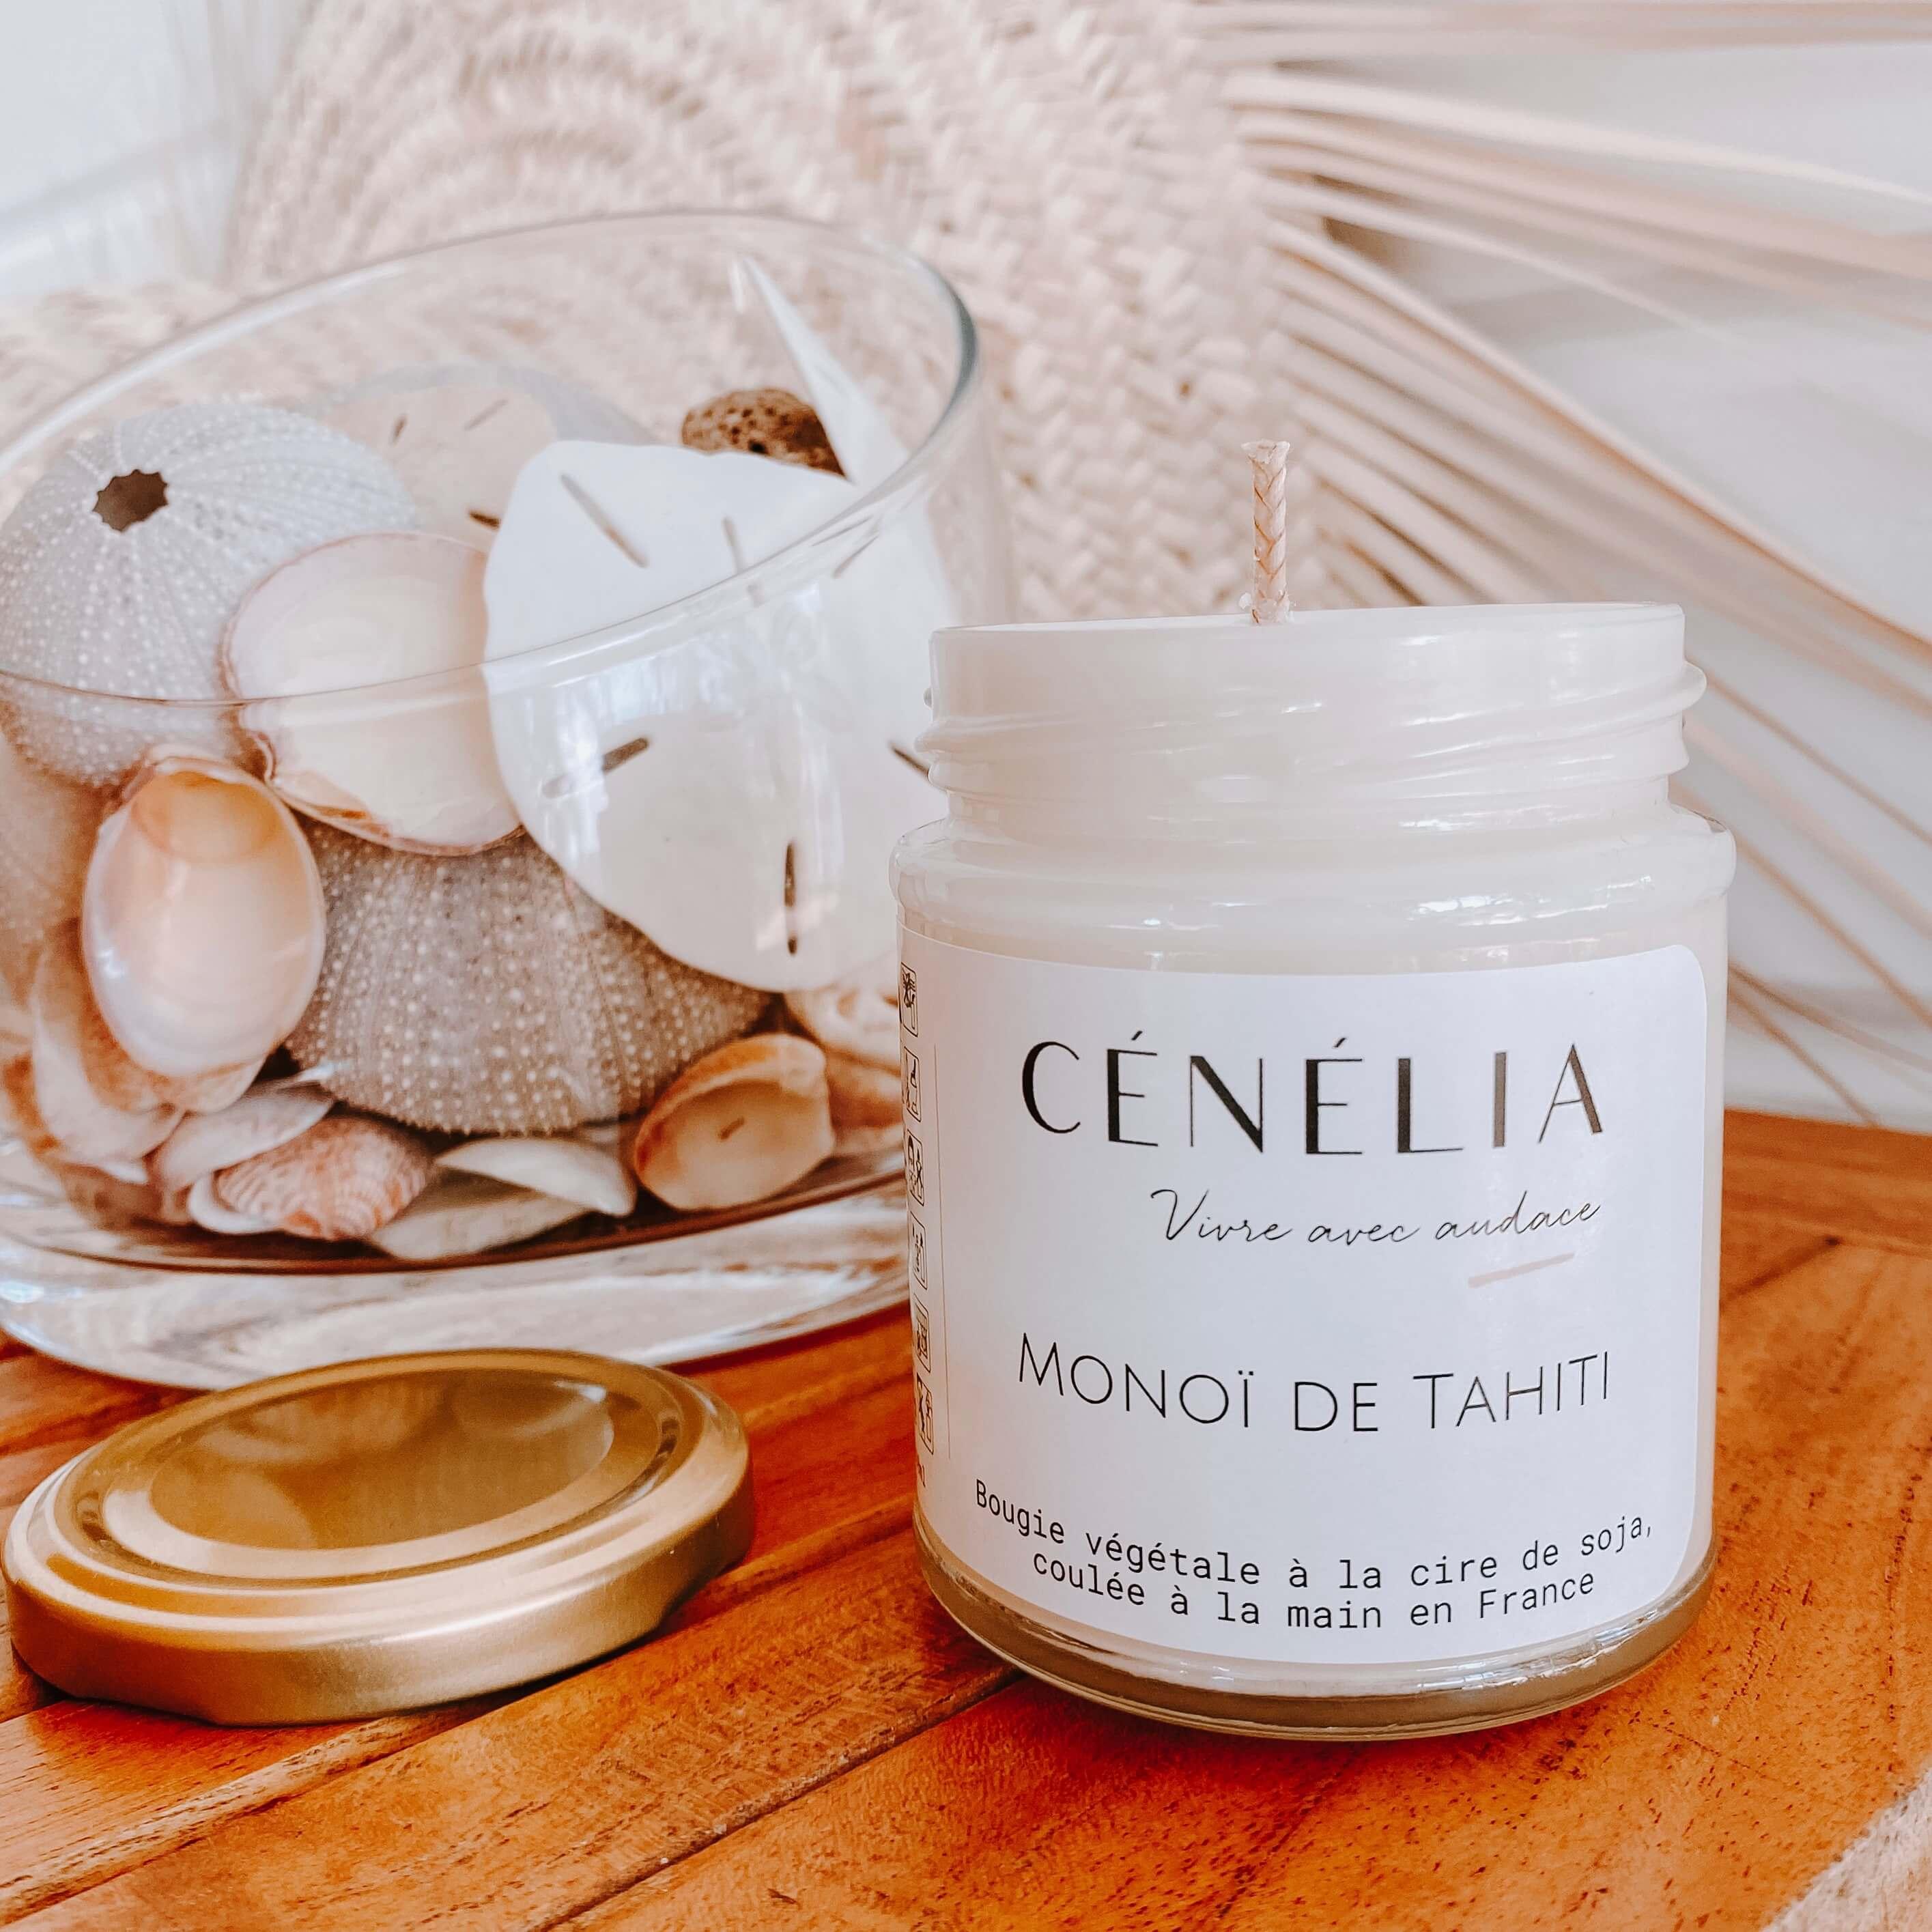 bougie vegan au monoï - bougie naturelle parfum monoï - Cénélia